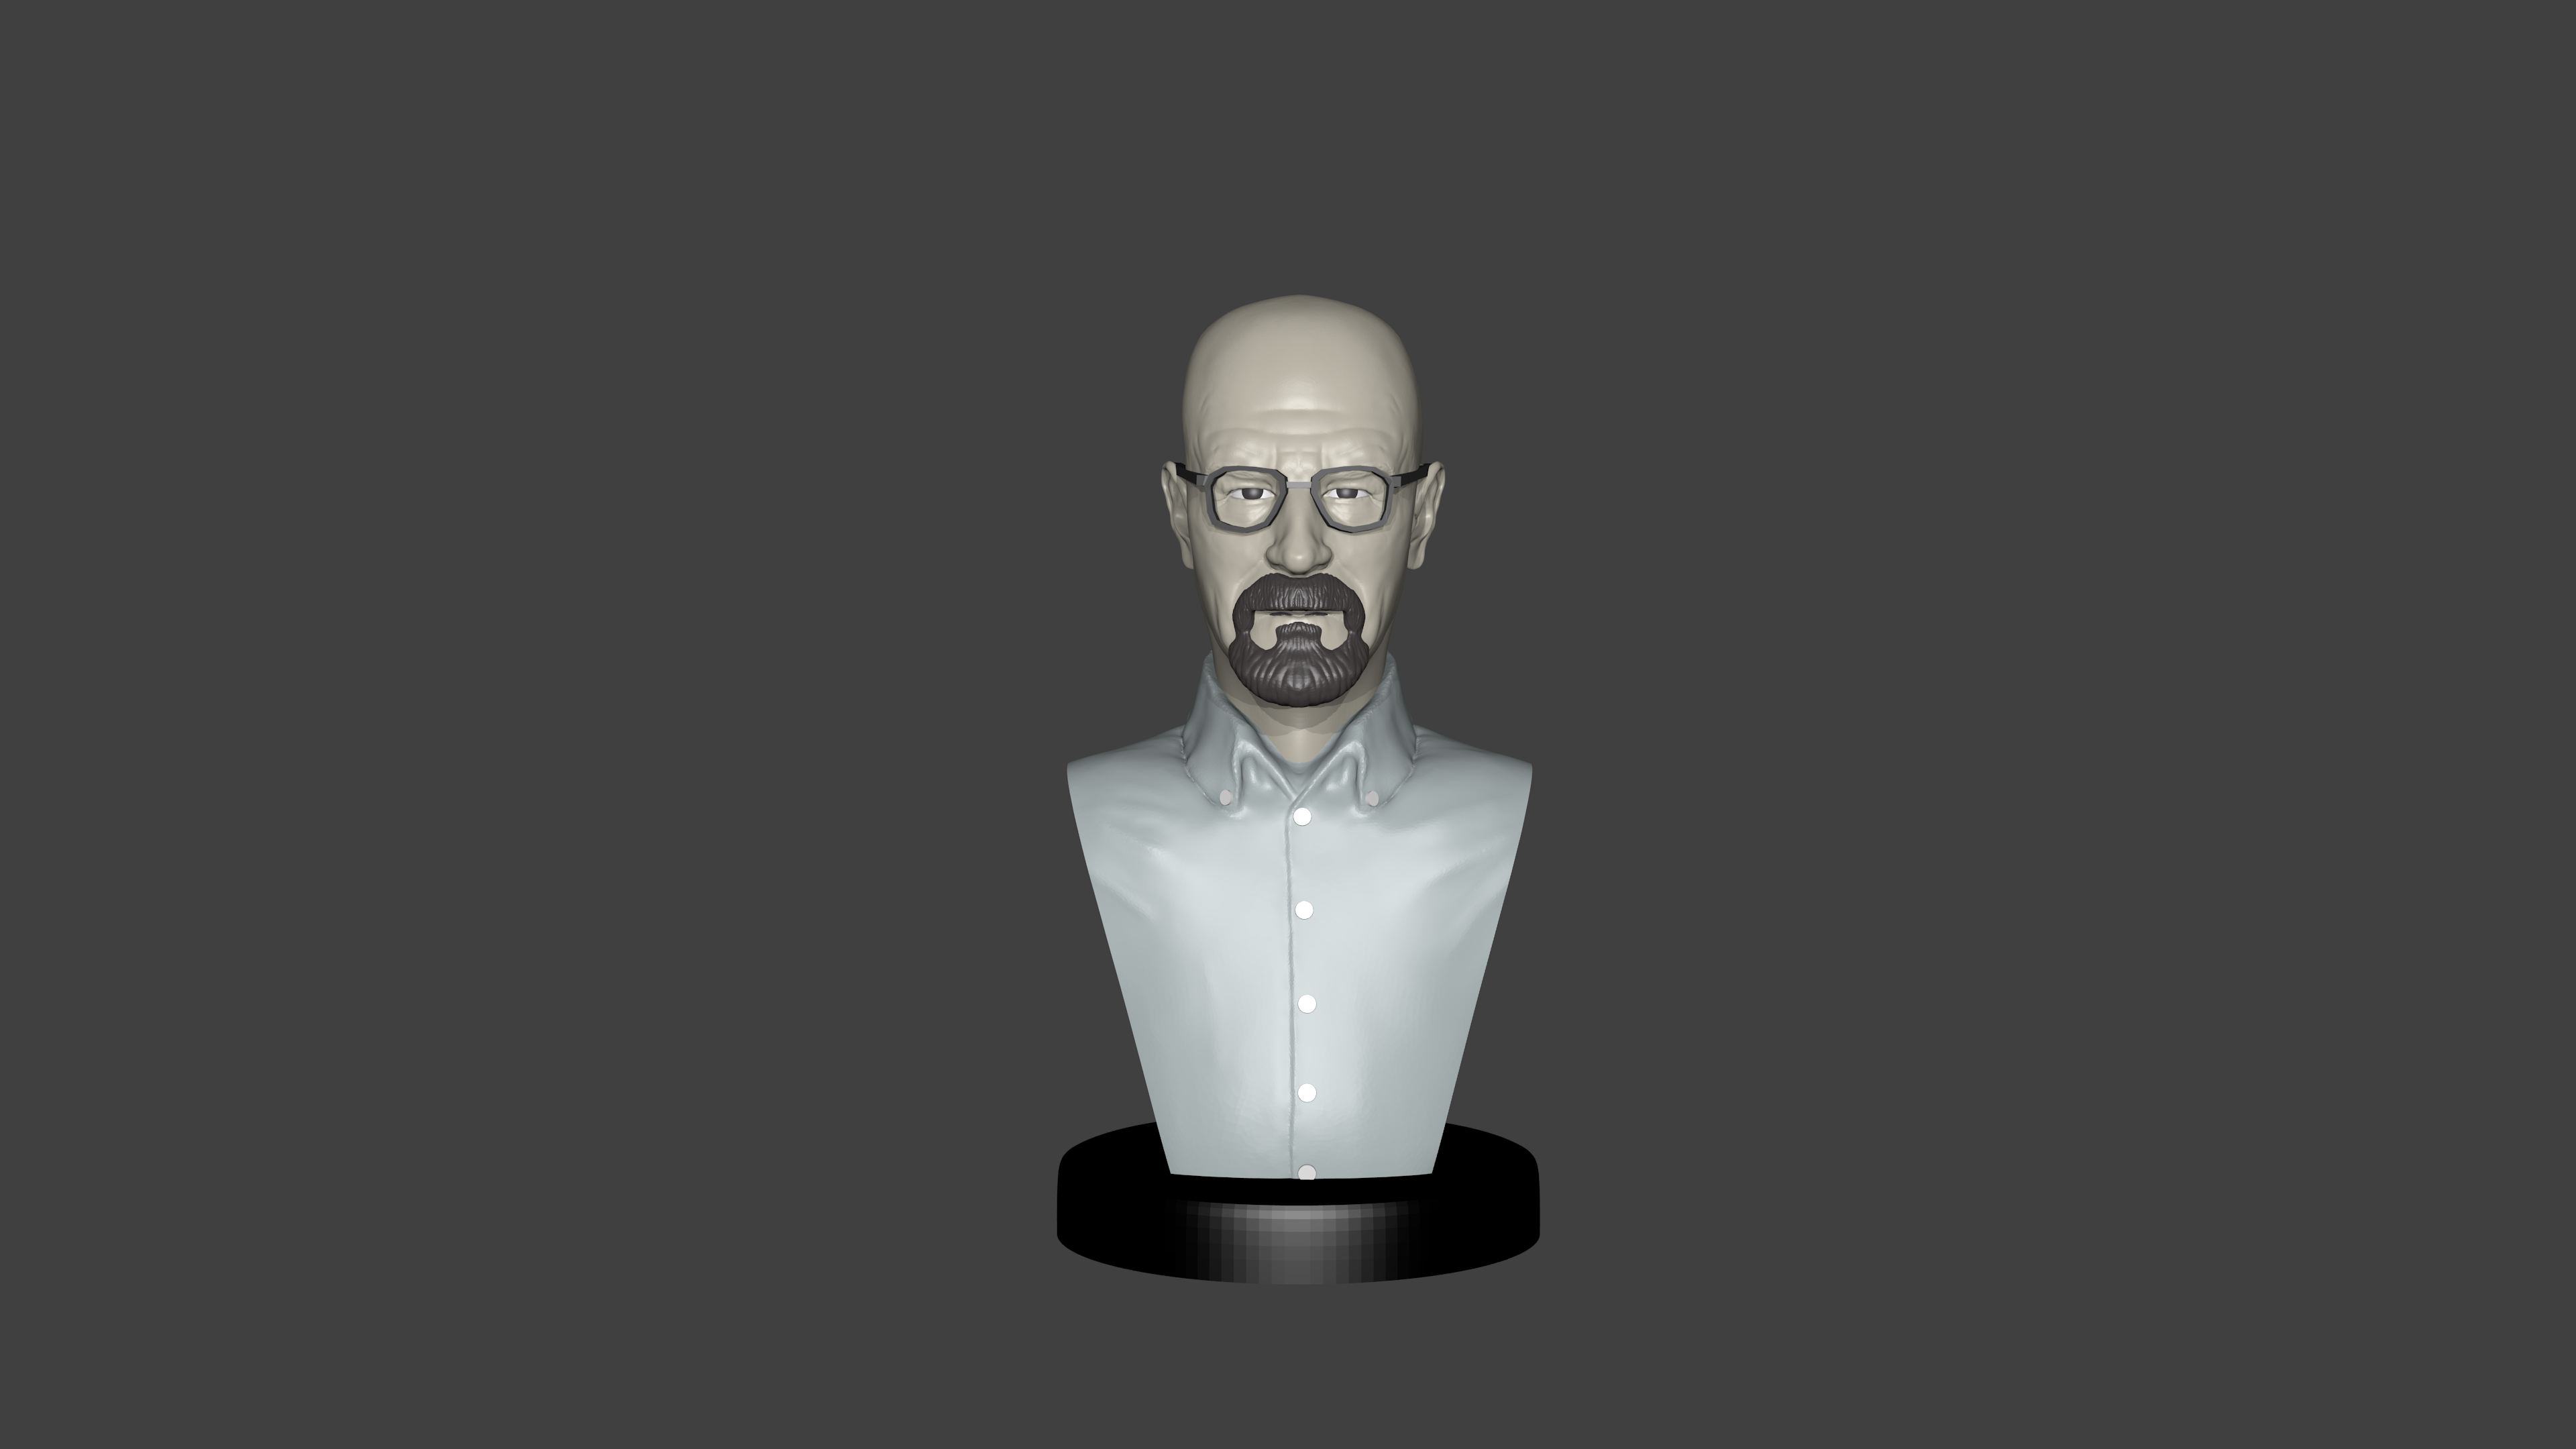 Render1.png Télécharger fichier STL gratuit Breaking Bad • Plan imprimable en 3D, Aslan3d